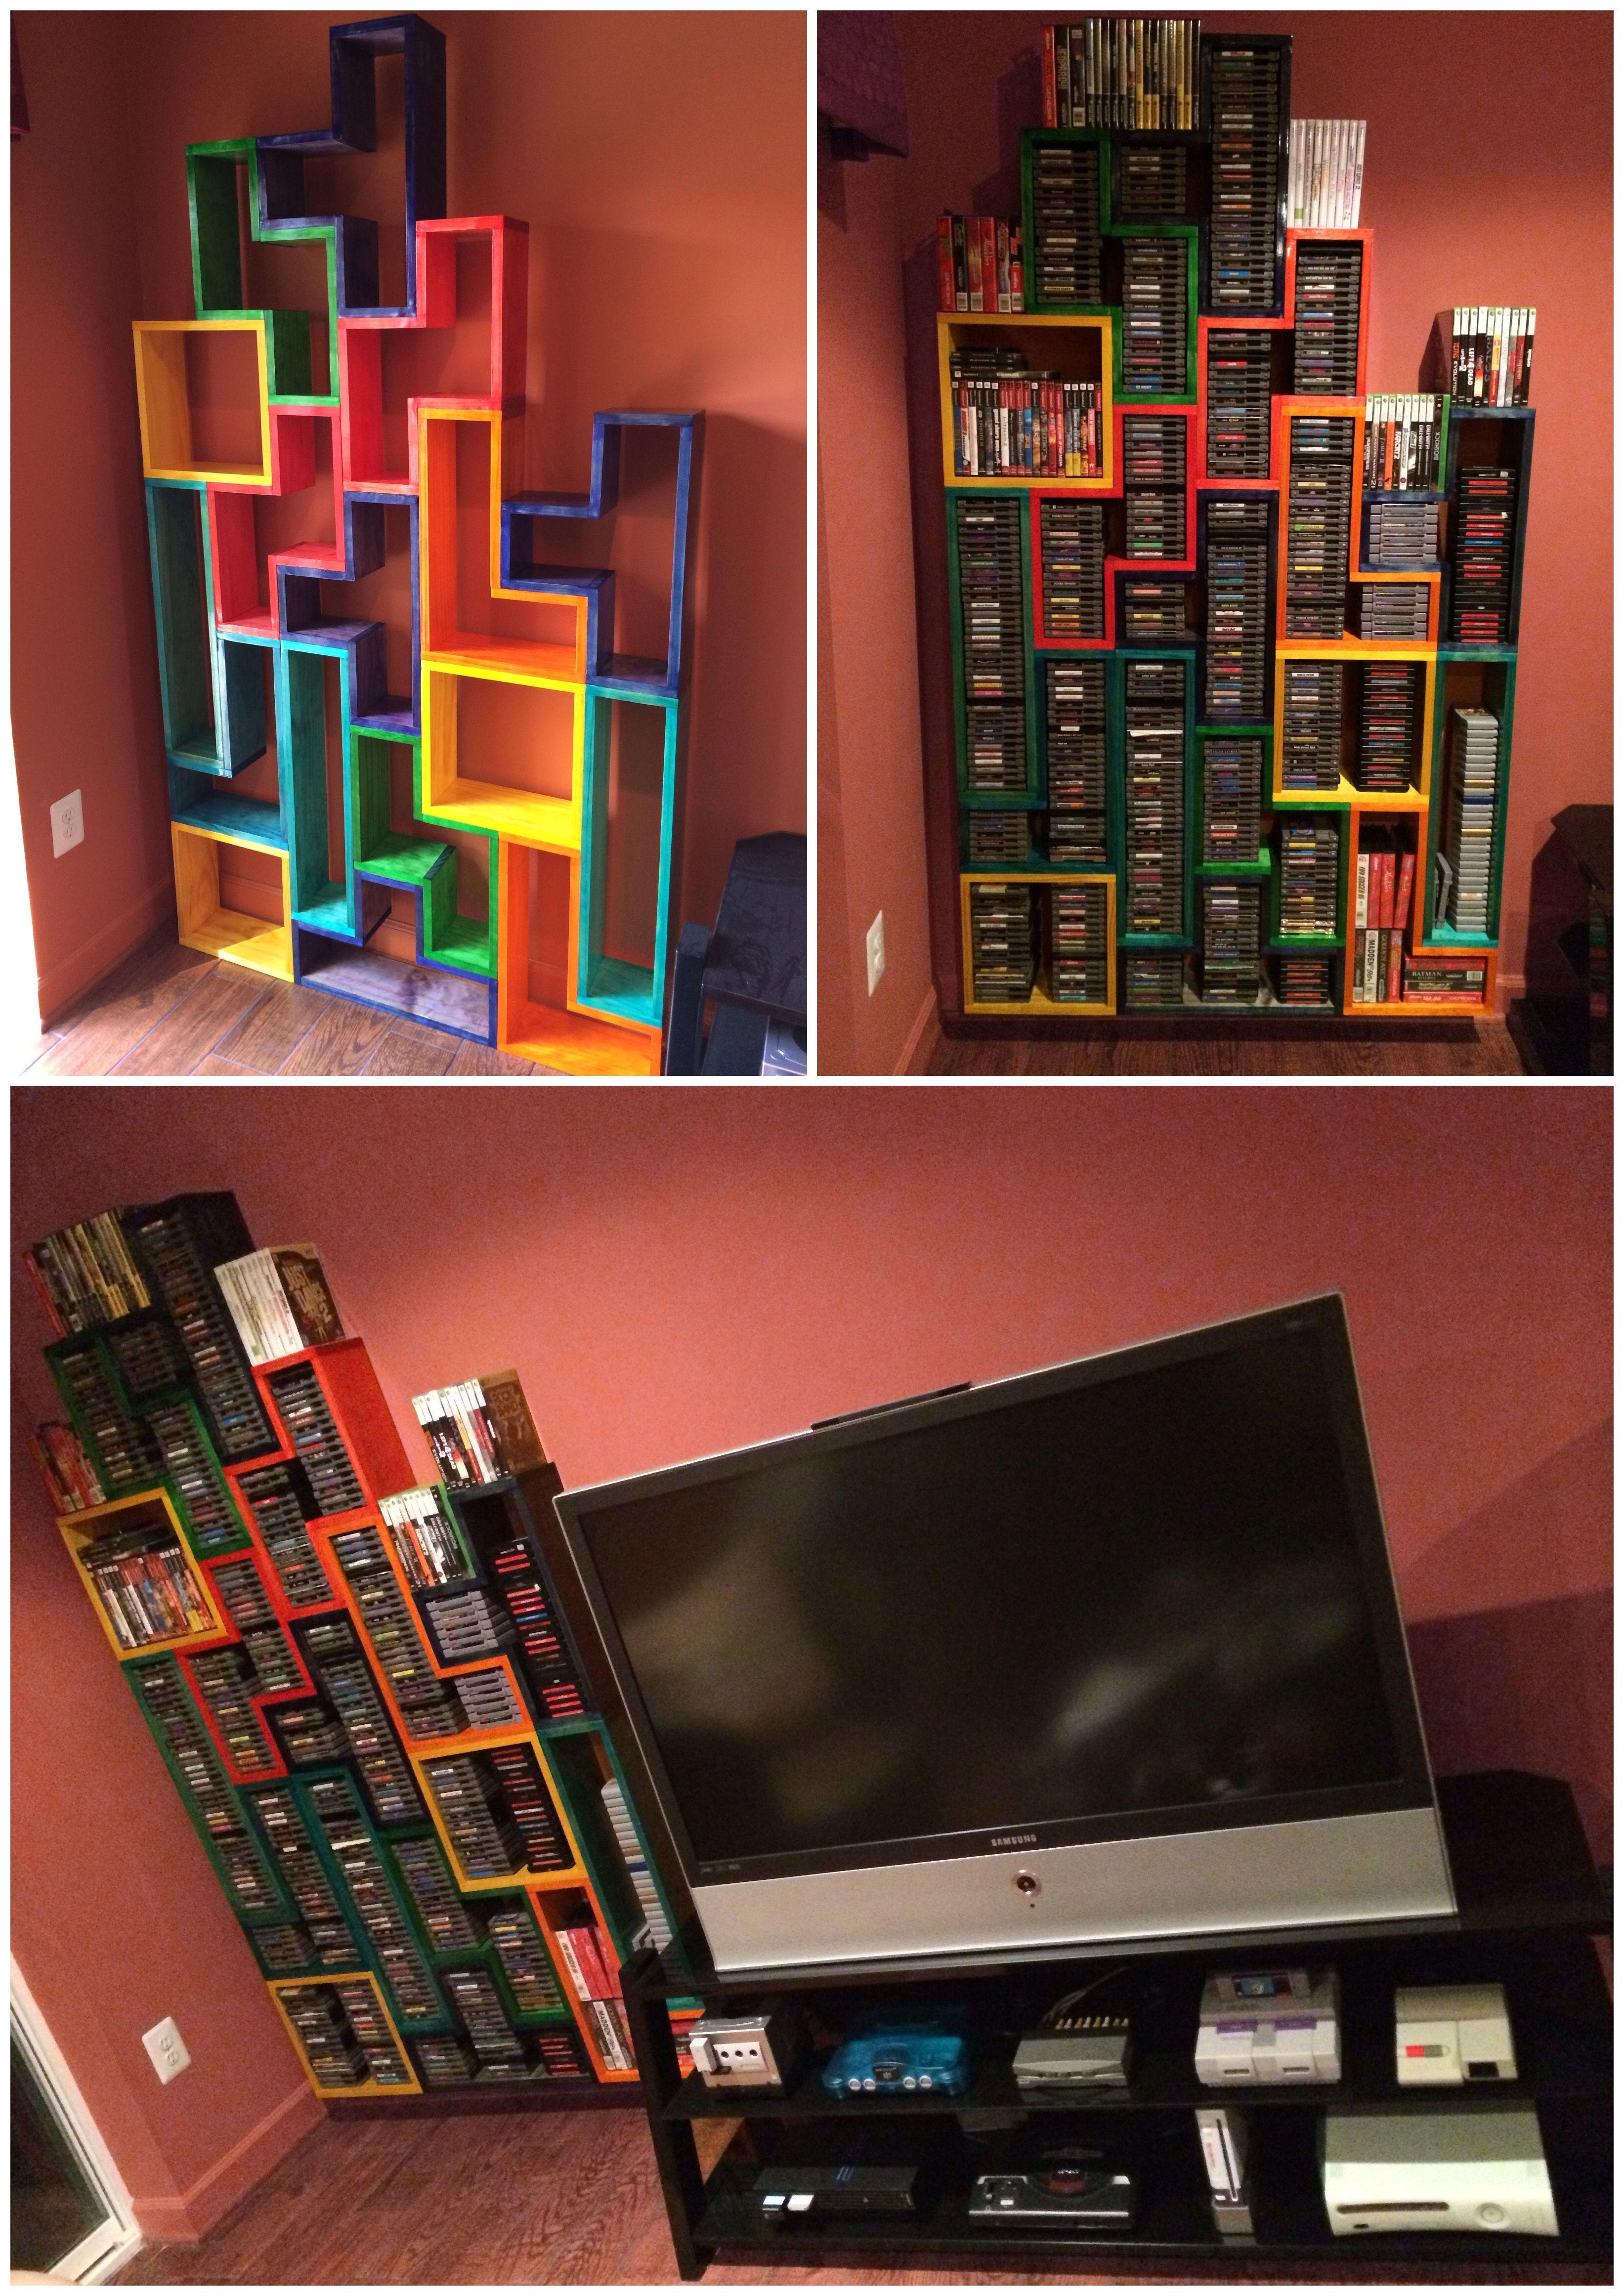 Tetris Wall O Games Shelves In 2020 Video Game Rooms Video Game Shelf Tetris